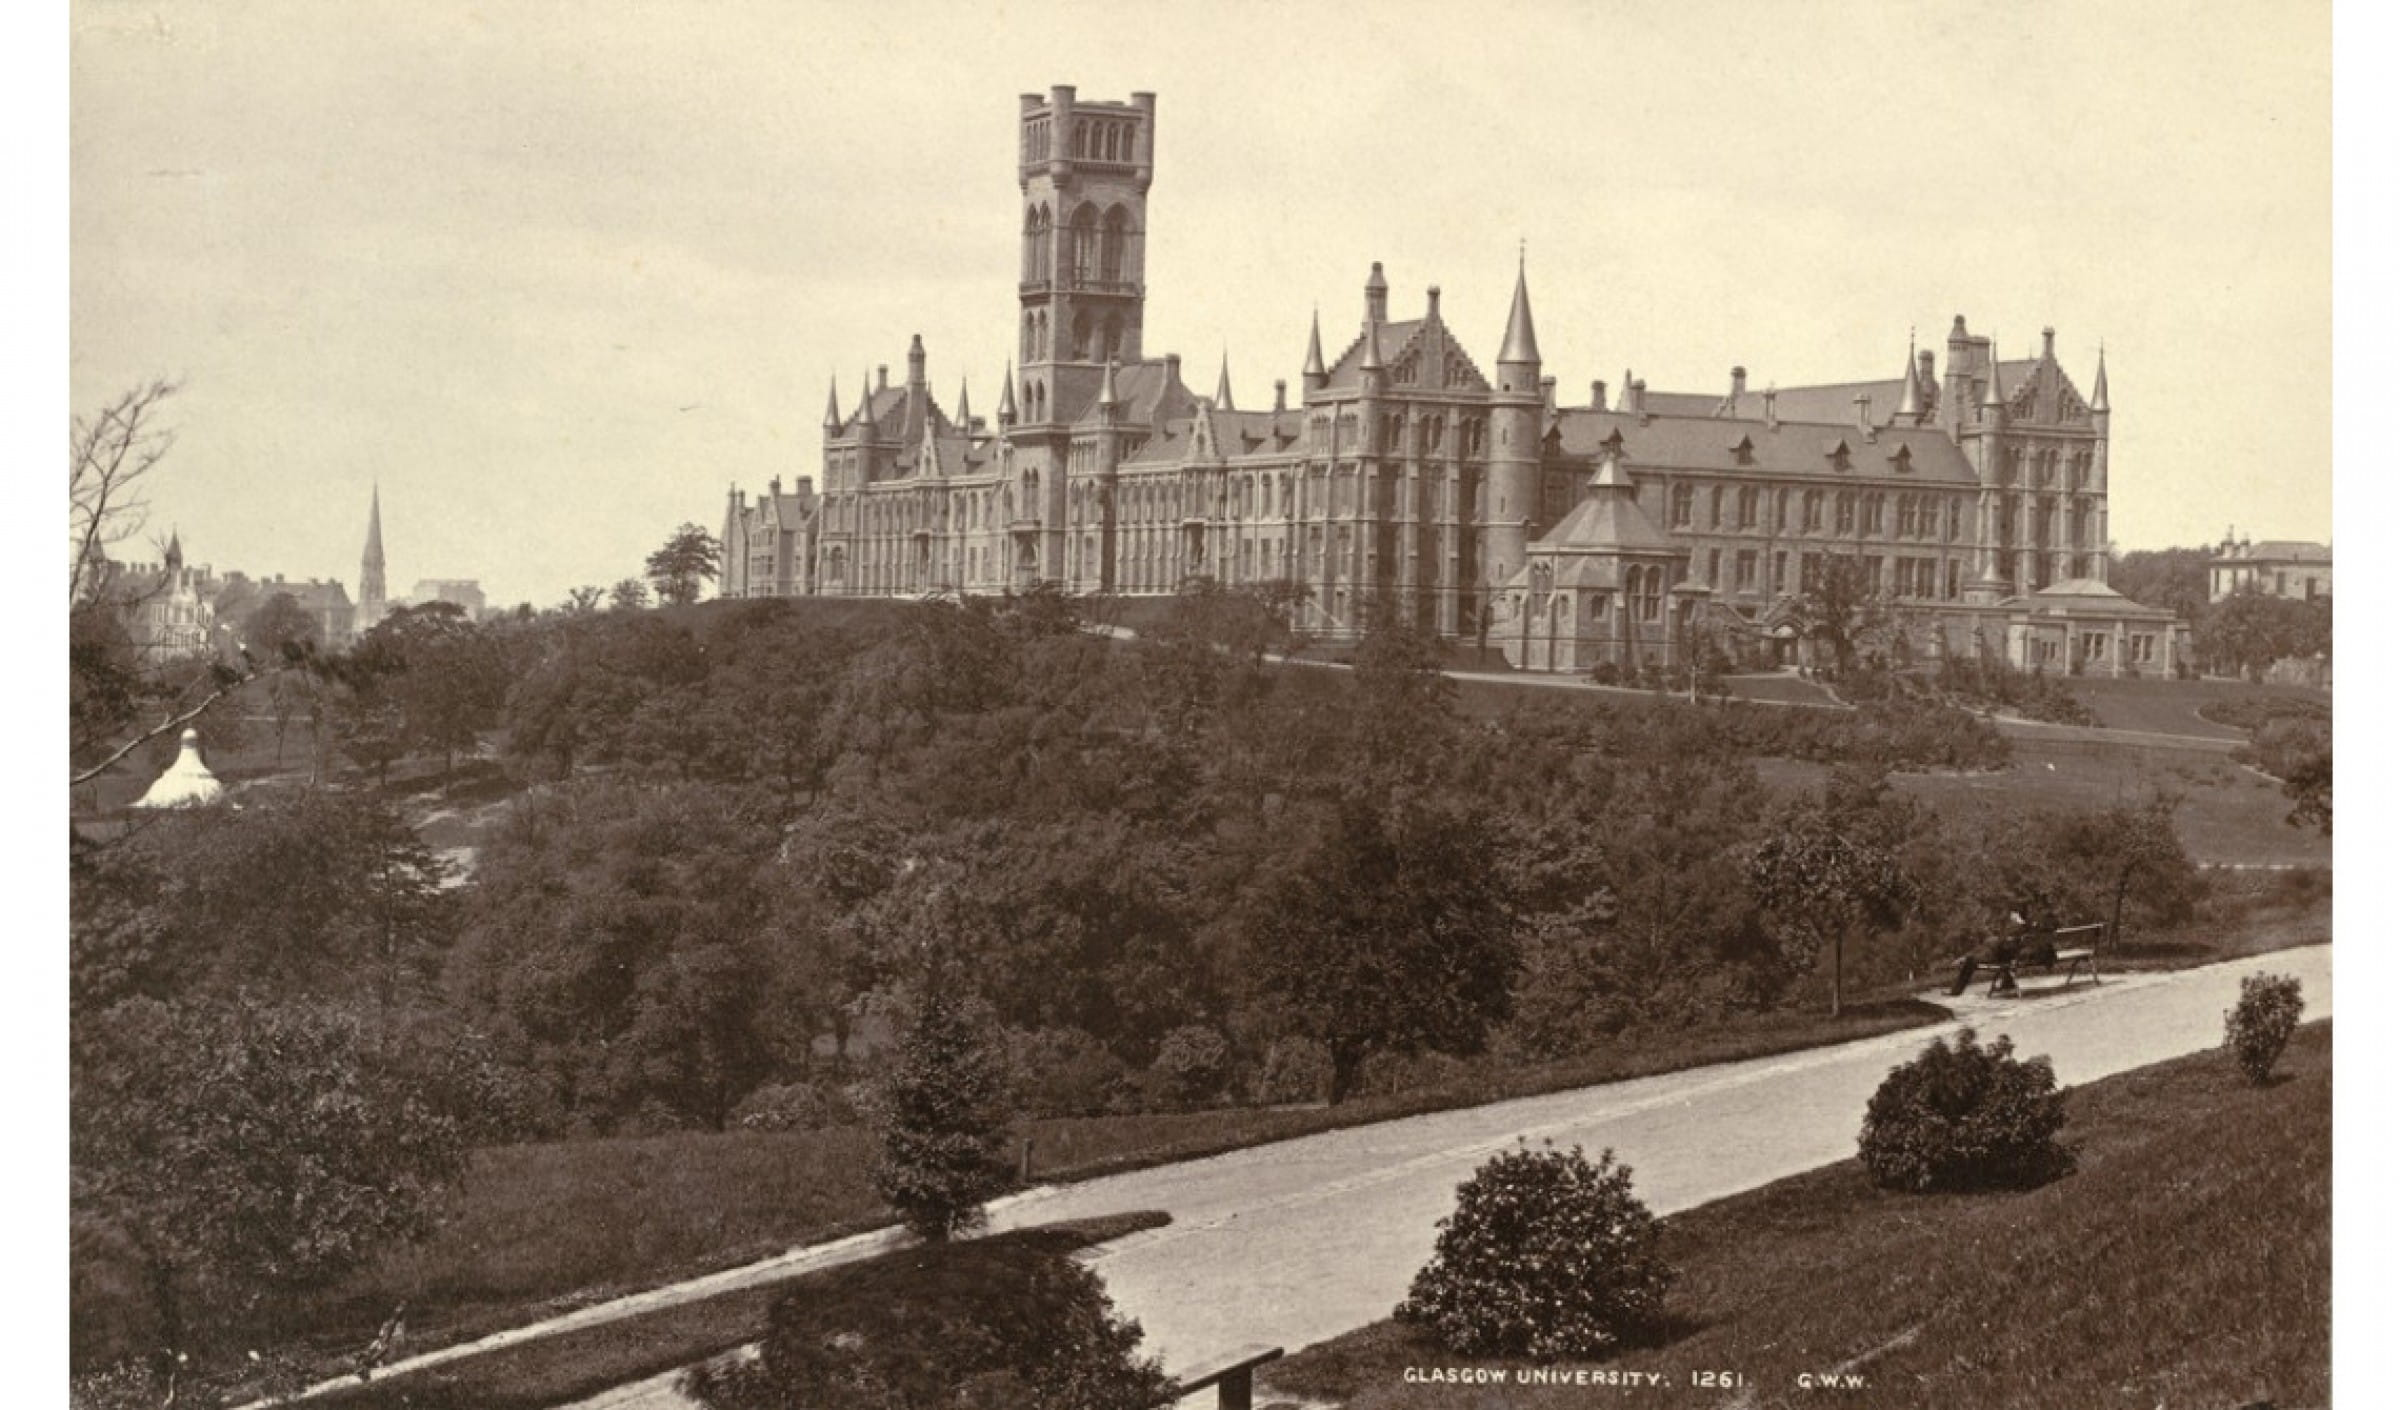 Something to aspire to (Glasgow University, by George Washington Wilson C. 1885)